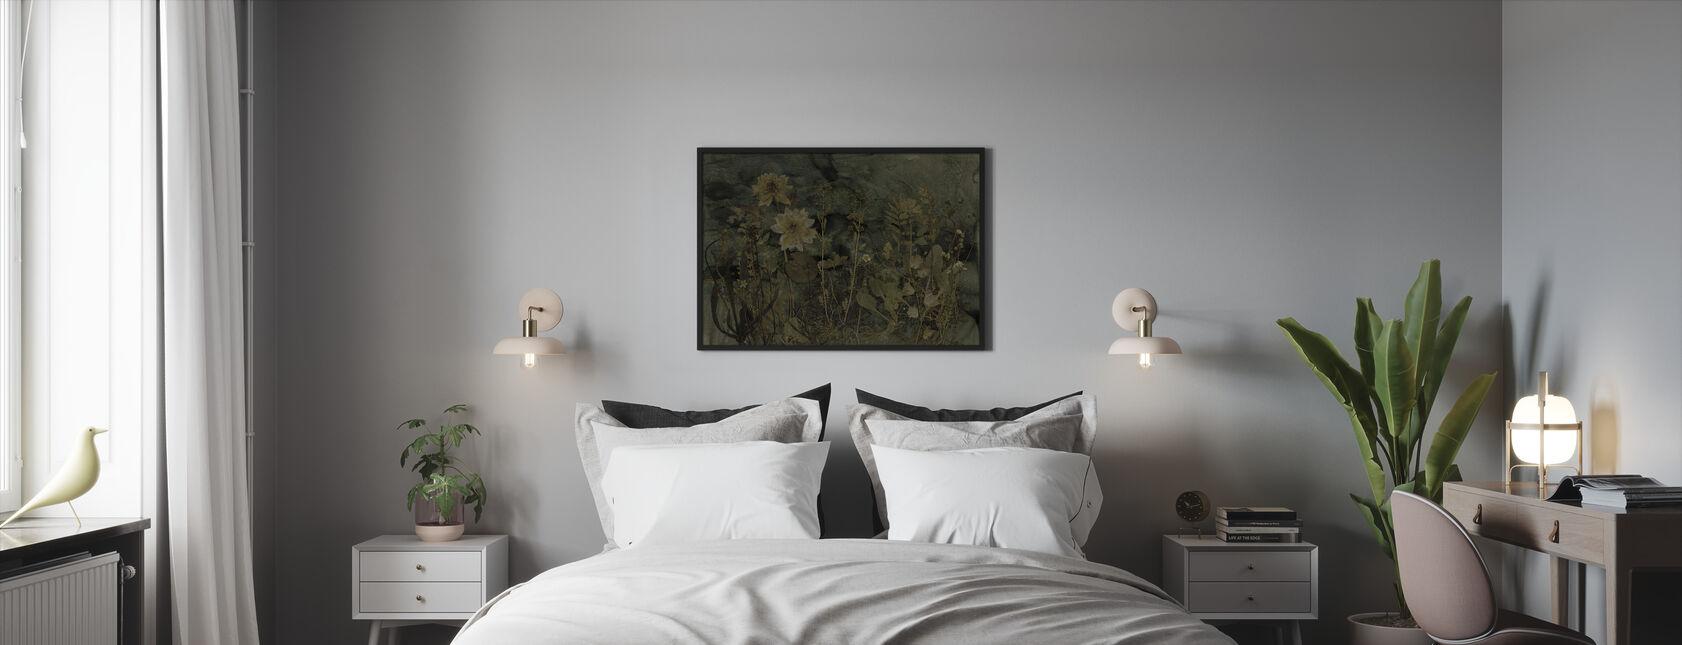 Teddy - Framed print - Bedroom